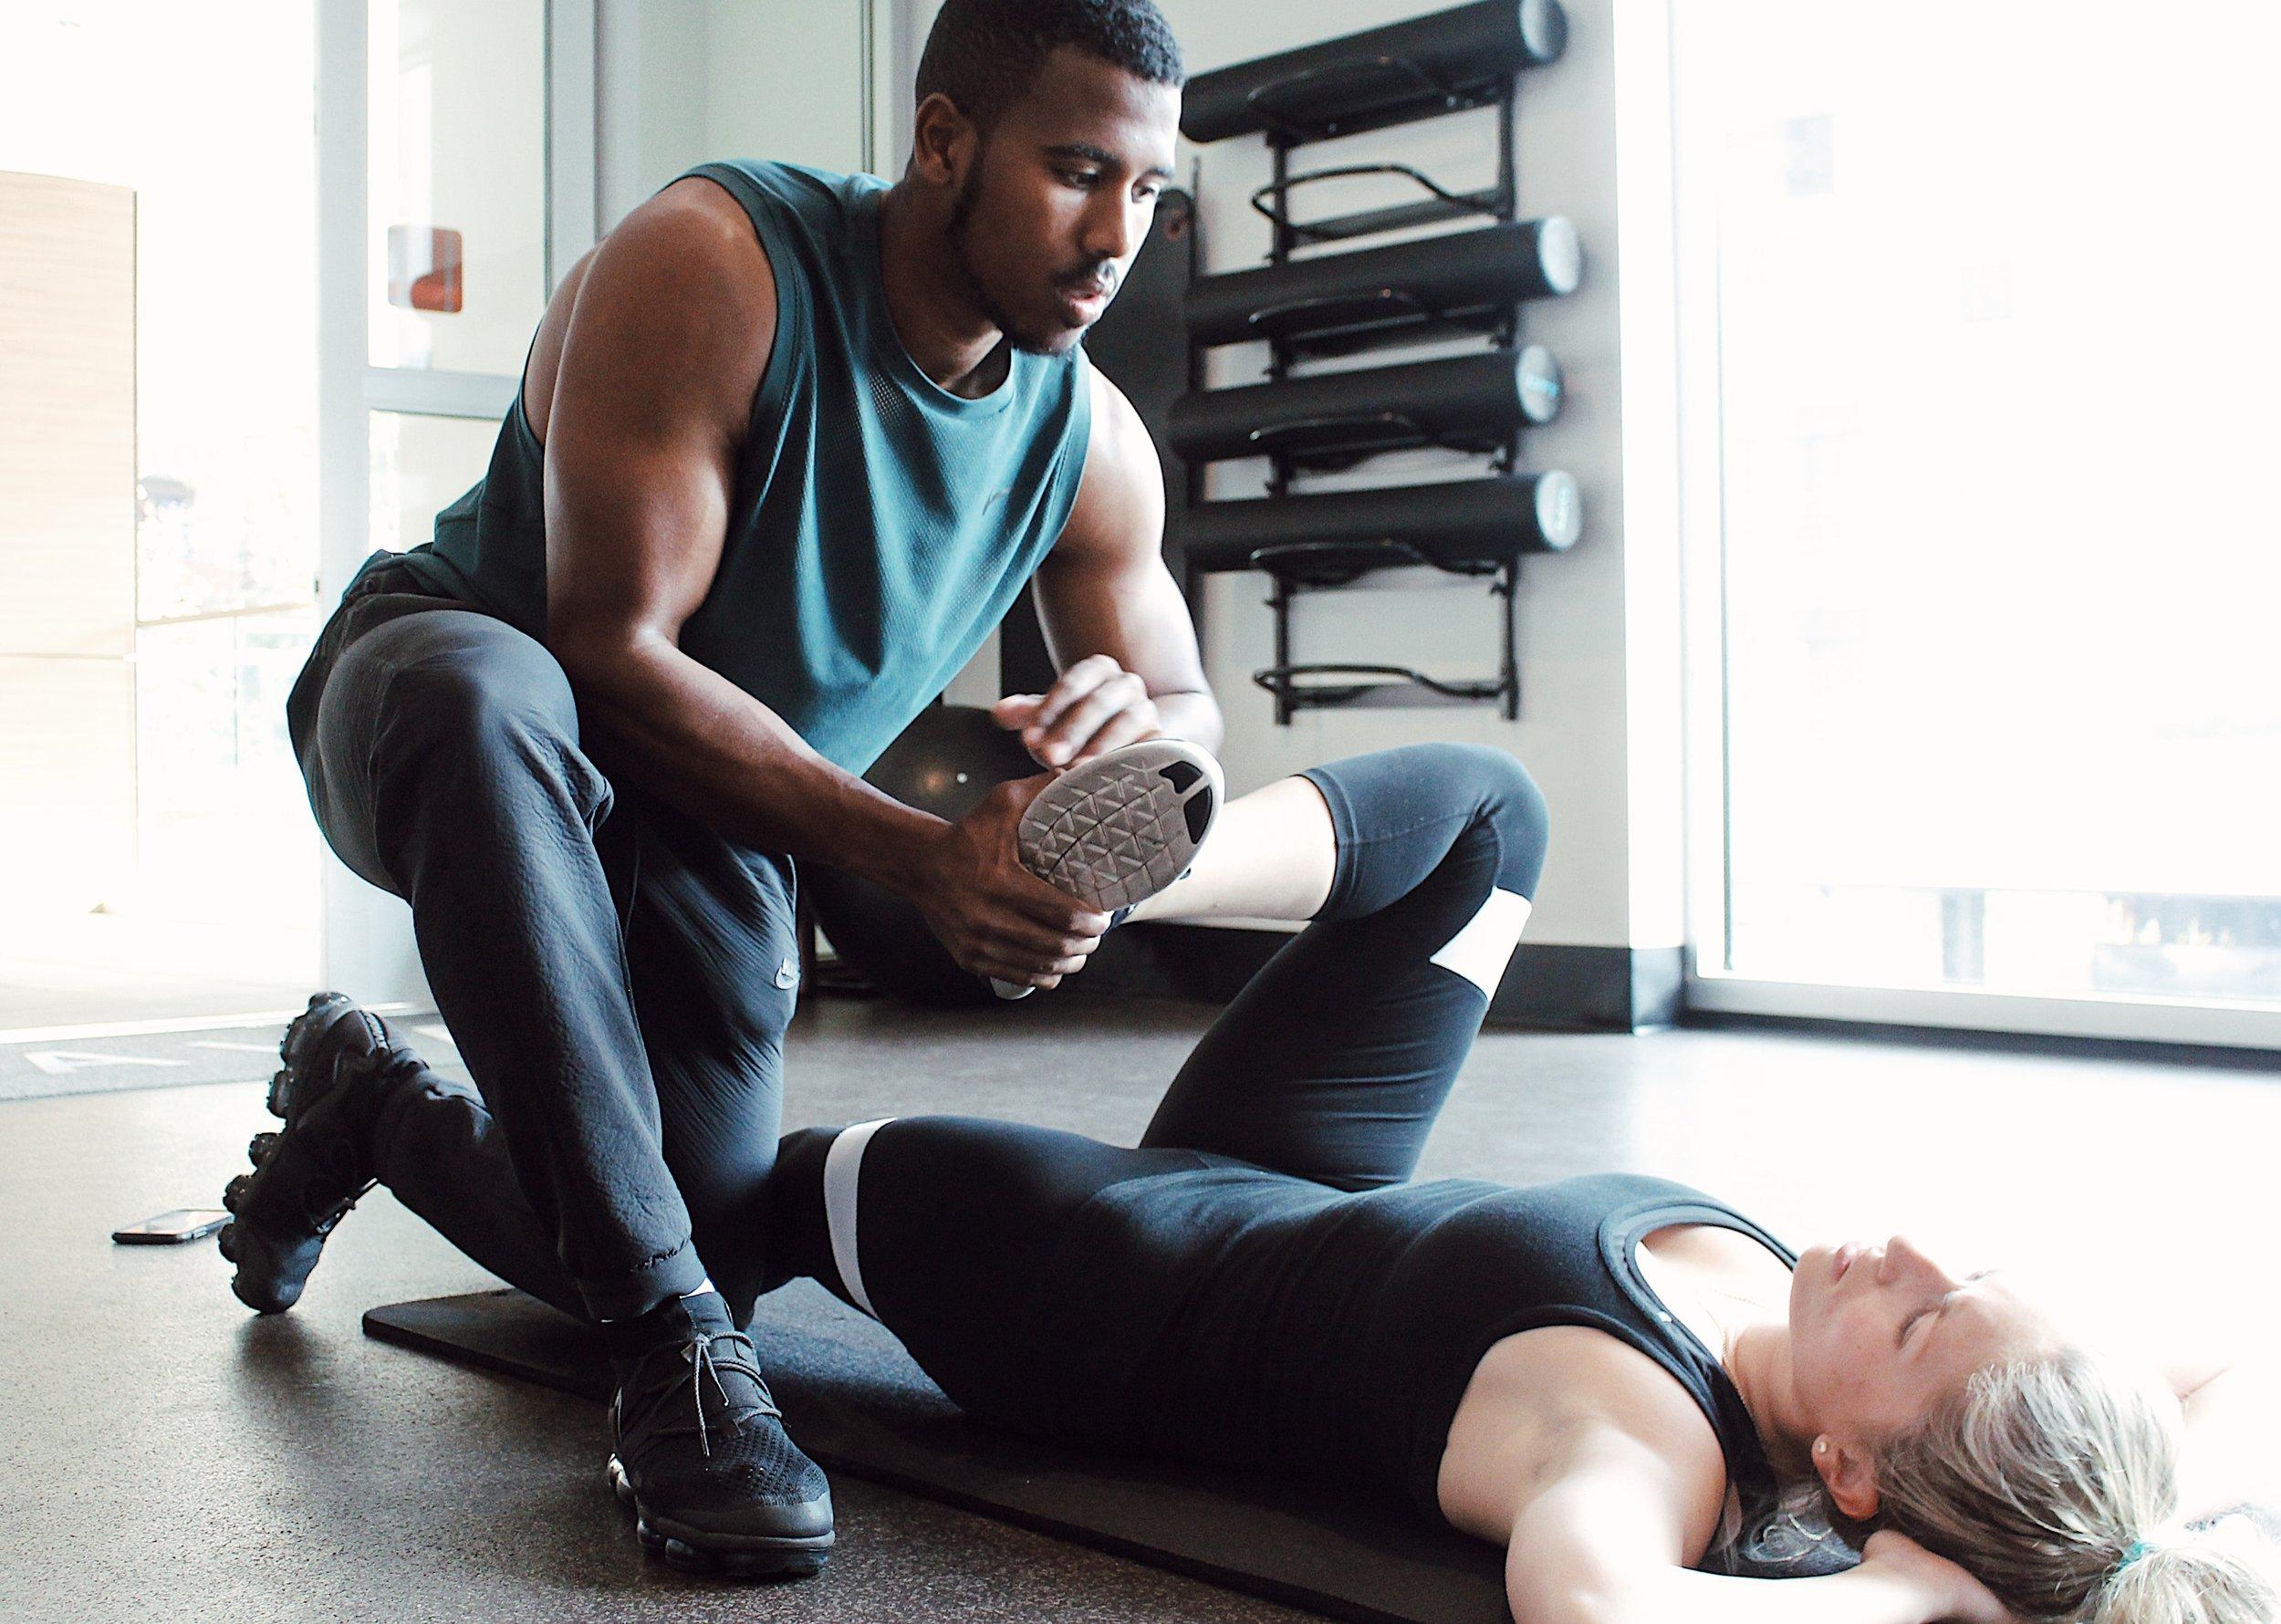 Natesanity Fitness - Trainer